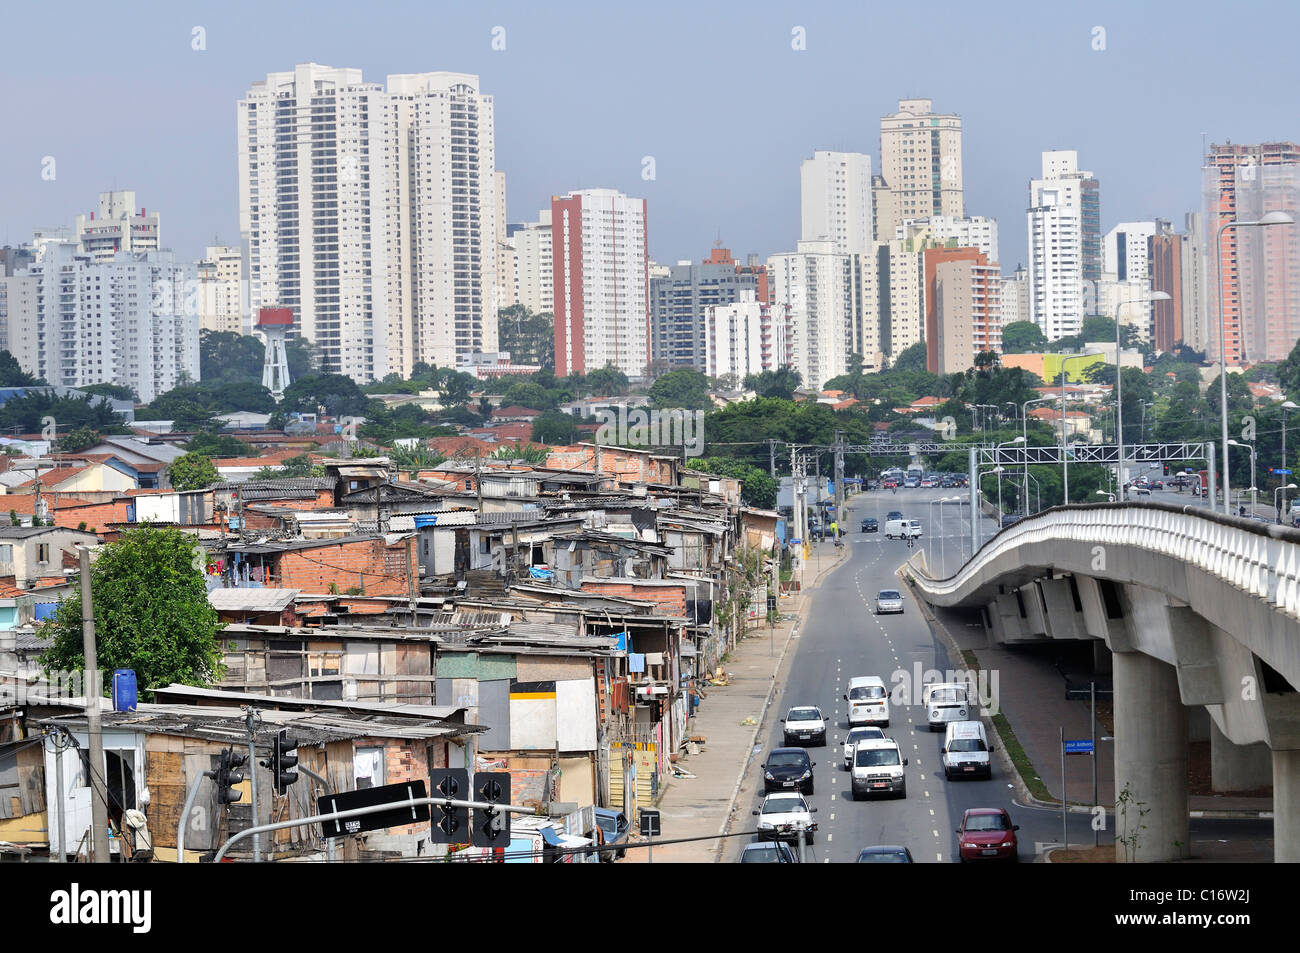 Paraisópolis favela in front of modern skyscrapers, contrast, Morumbi district, Sao Paulo, Brazil, South America - Stock Image